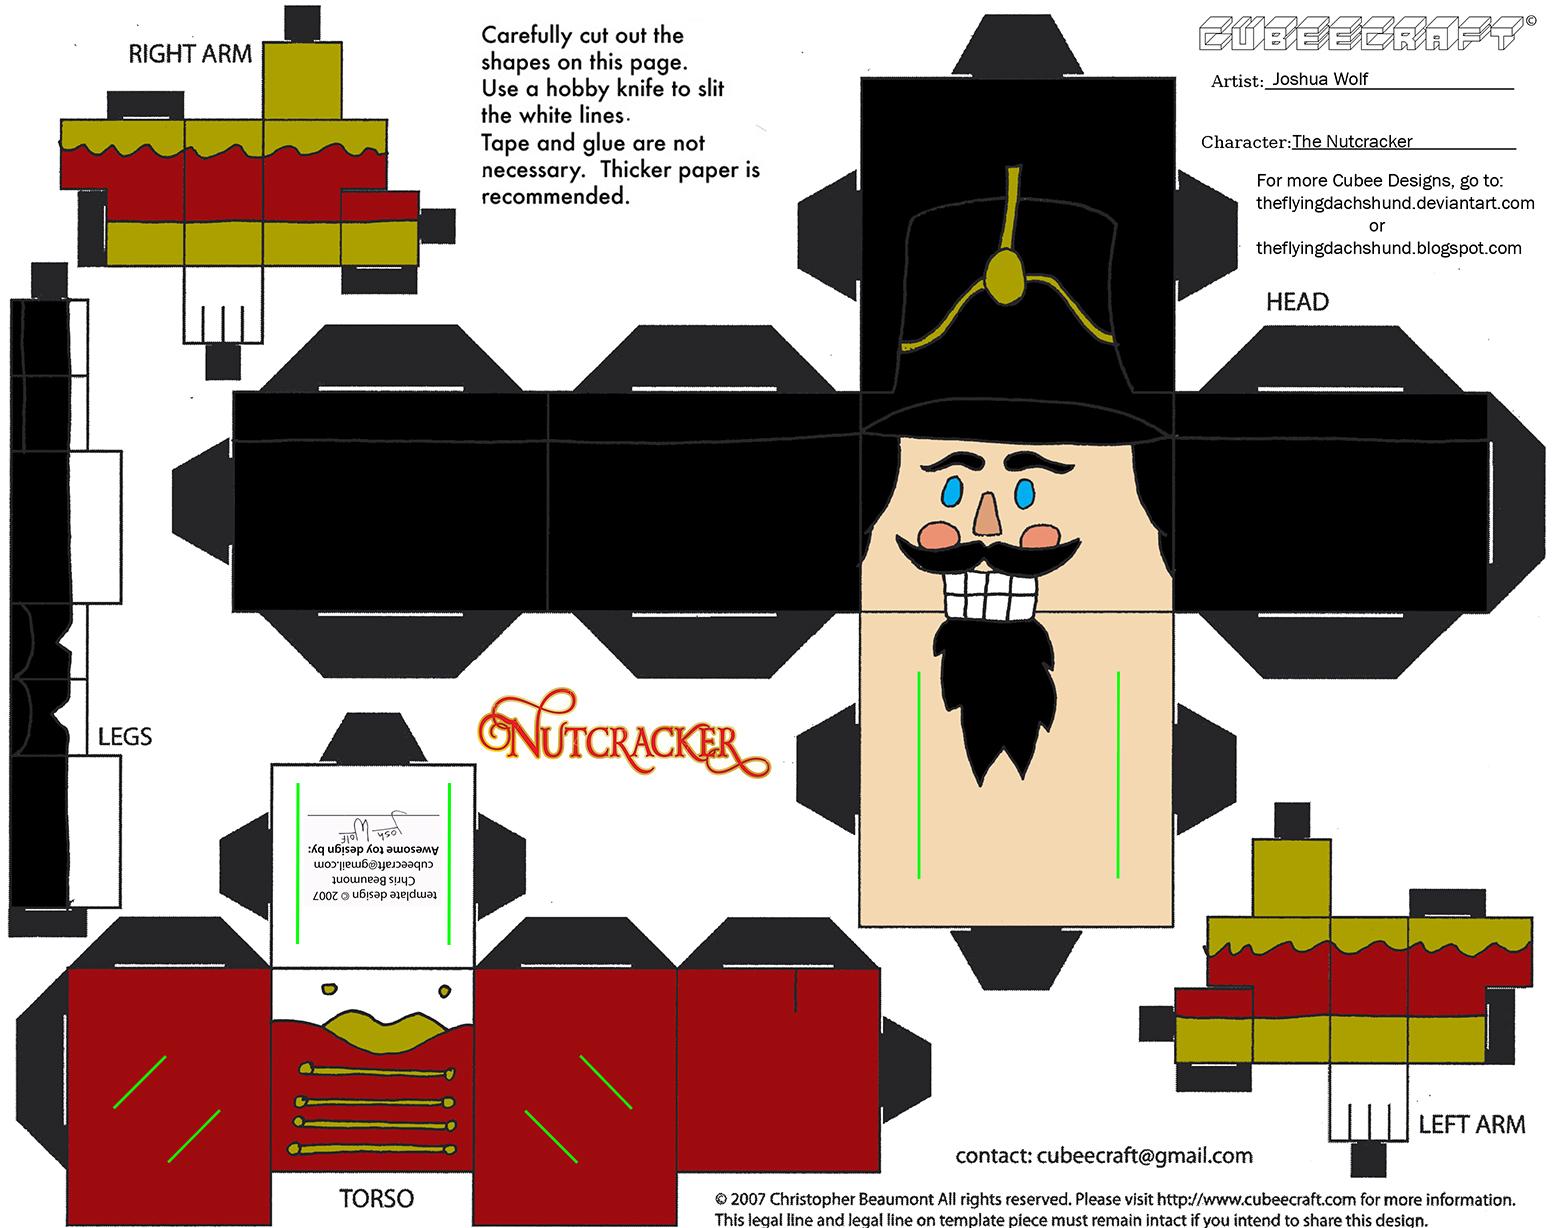 Mas21: The Nutcracker Cubee by TheFlyingDachshund on DeviantArt